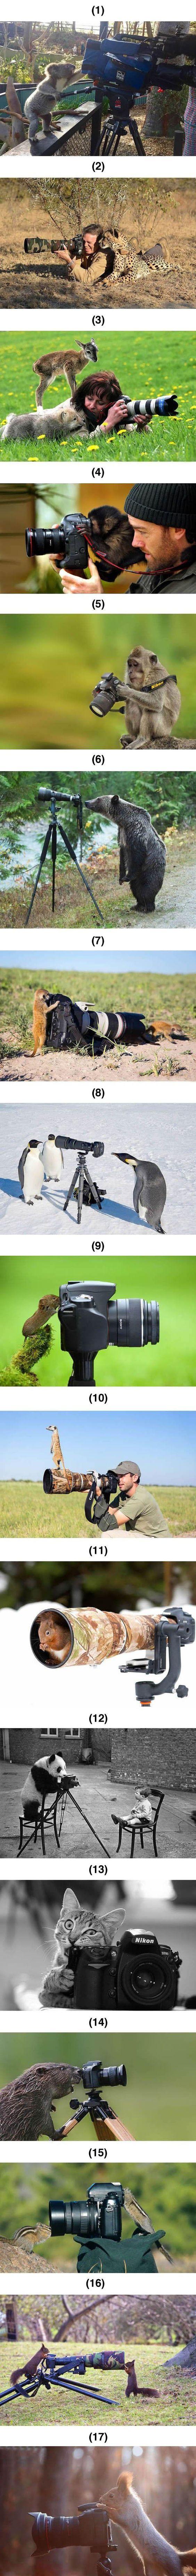 Animals taking up photography